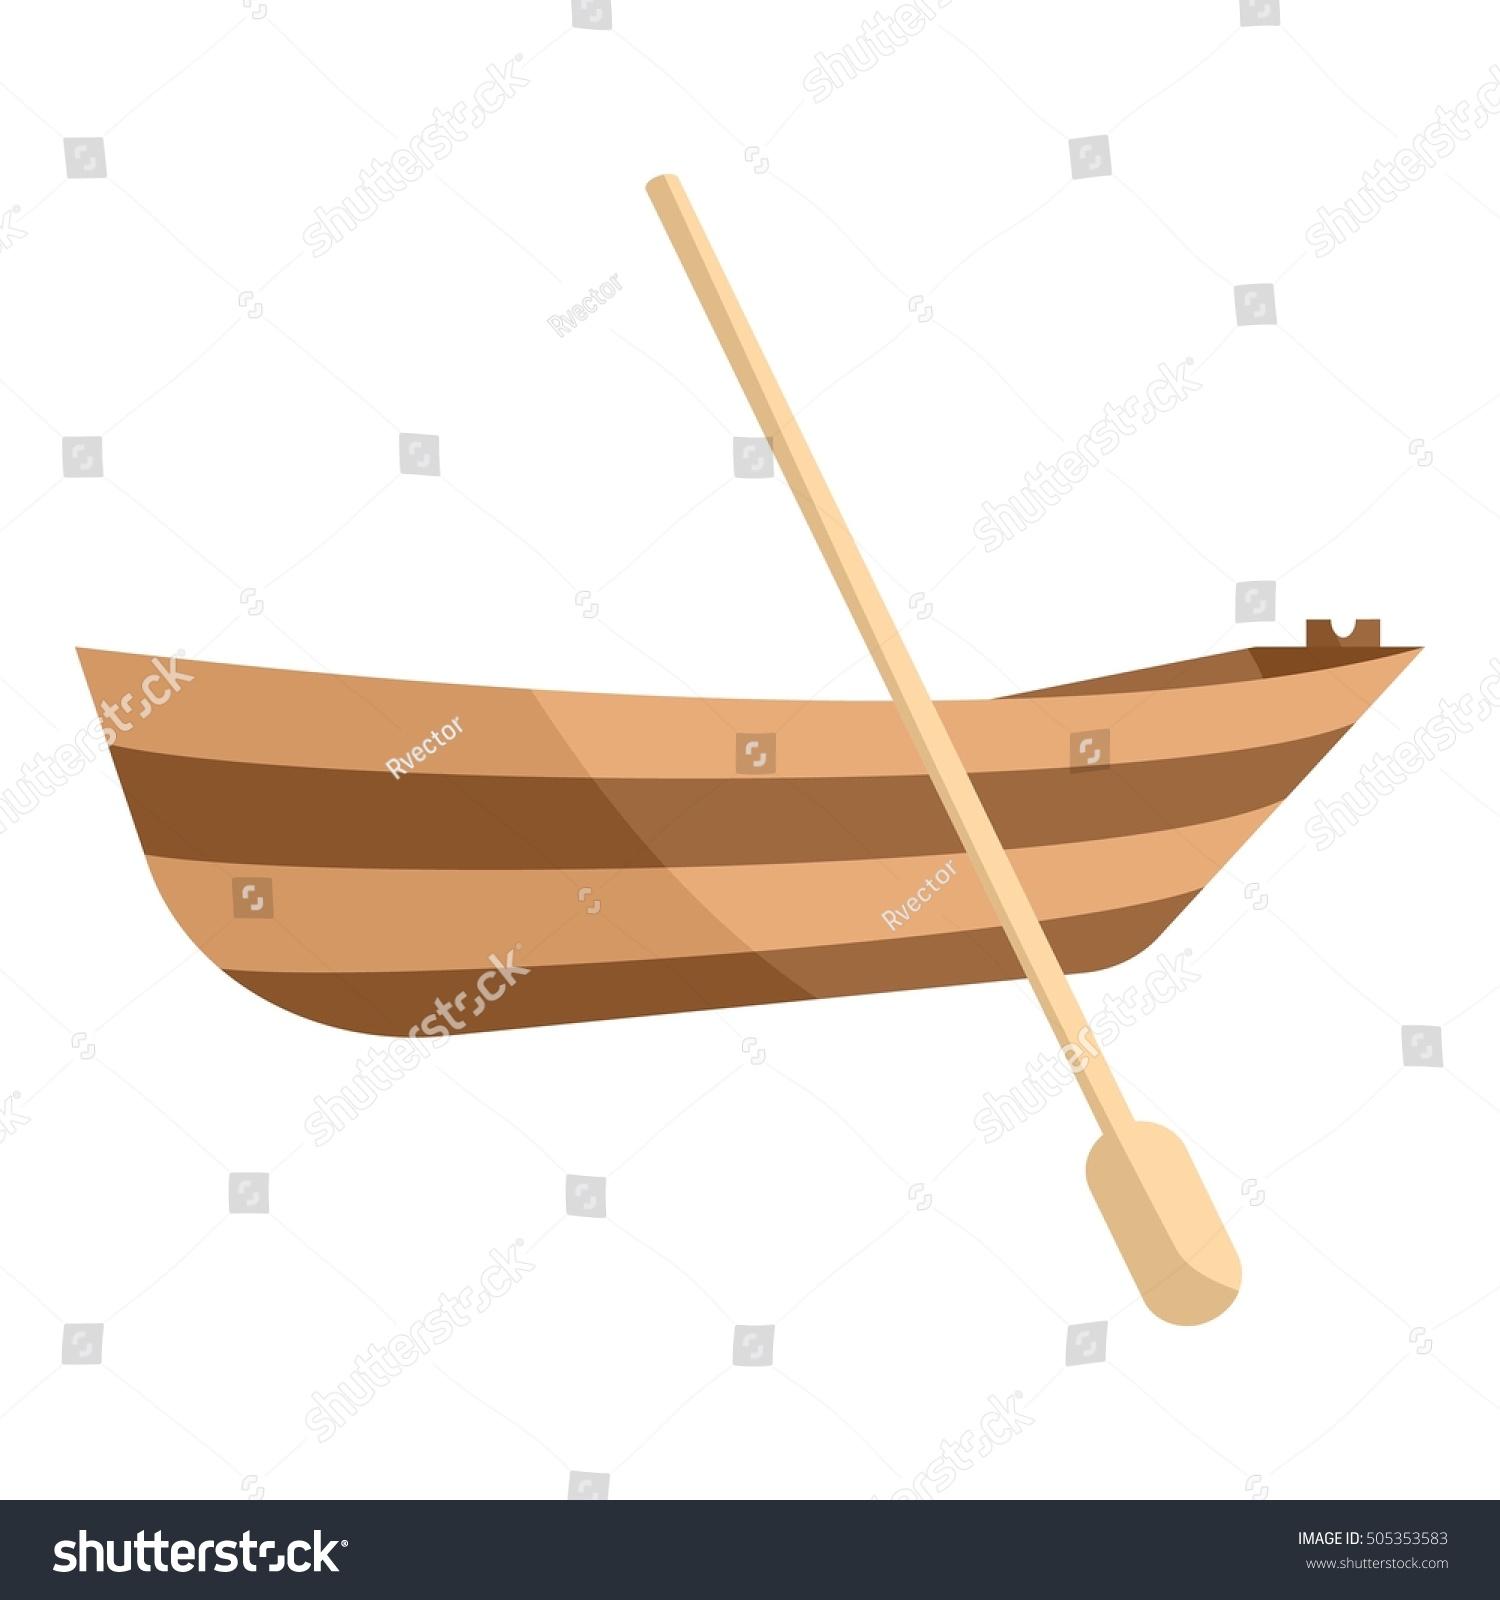 wooden boat paddle icon cartoon illustration stock illustration